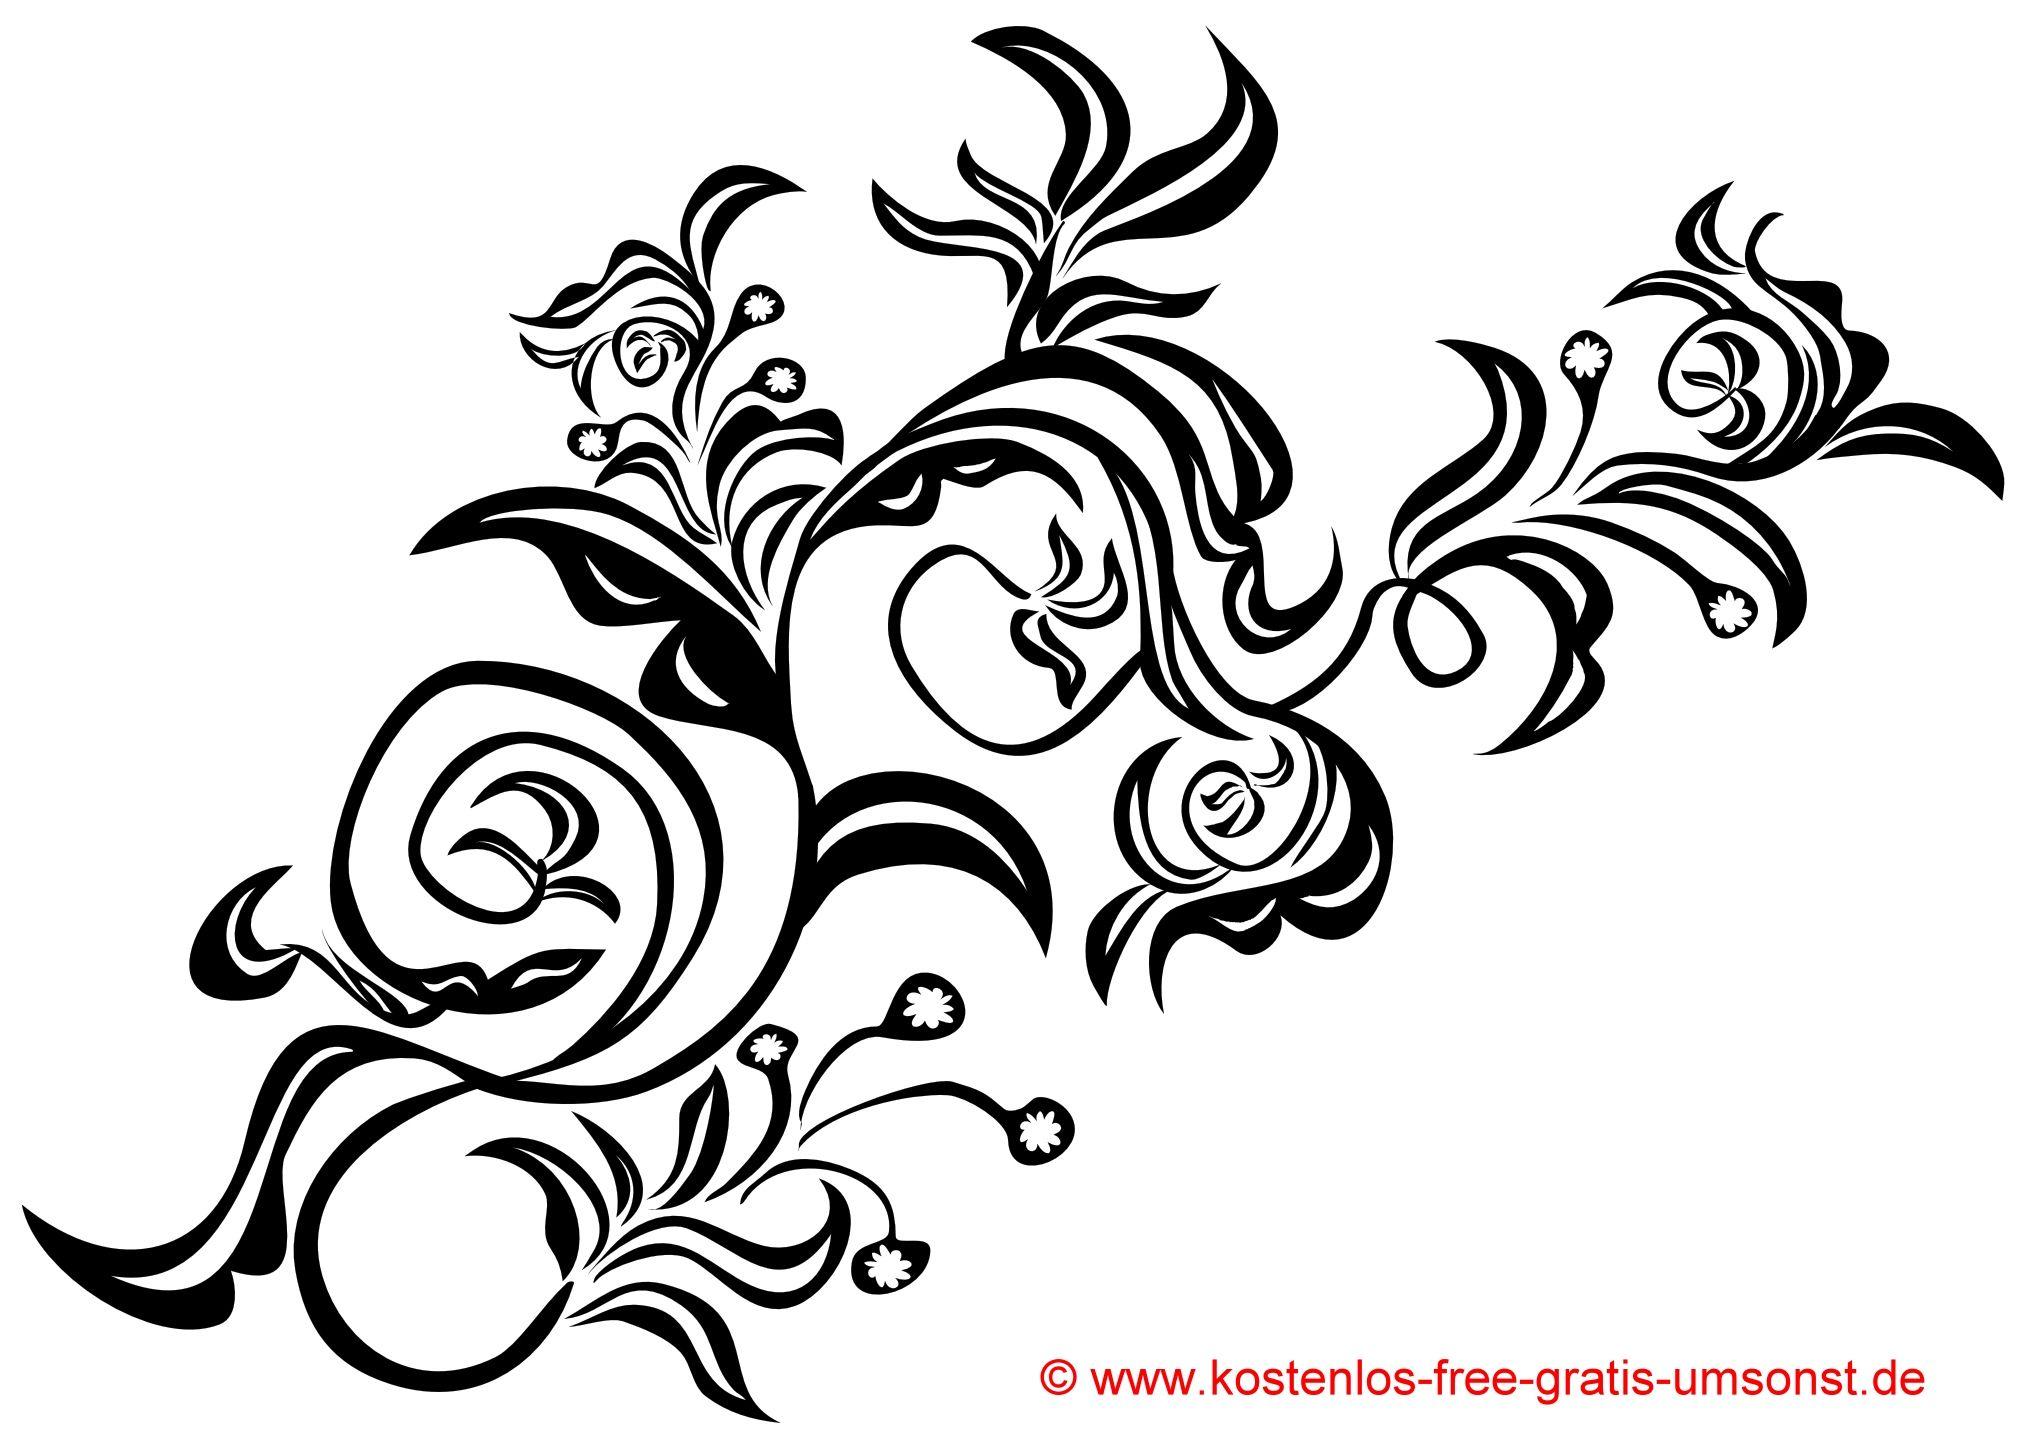 blumen tattoo vorlage flowers tattoo motive tribal. Black Bedroom Furniture Sets. Home Design Ideas